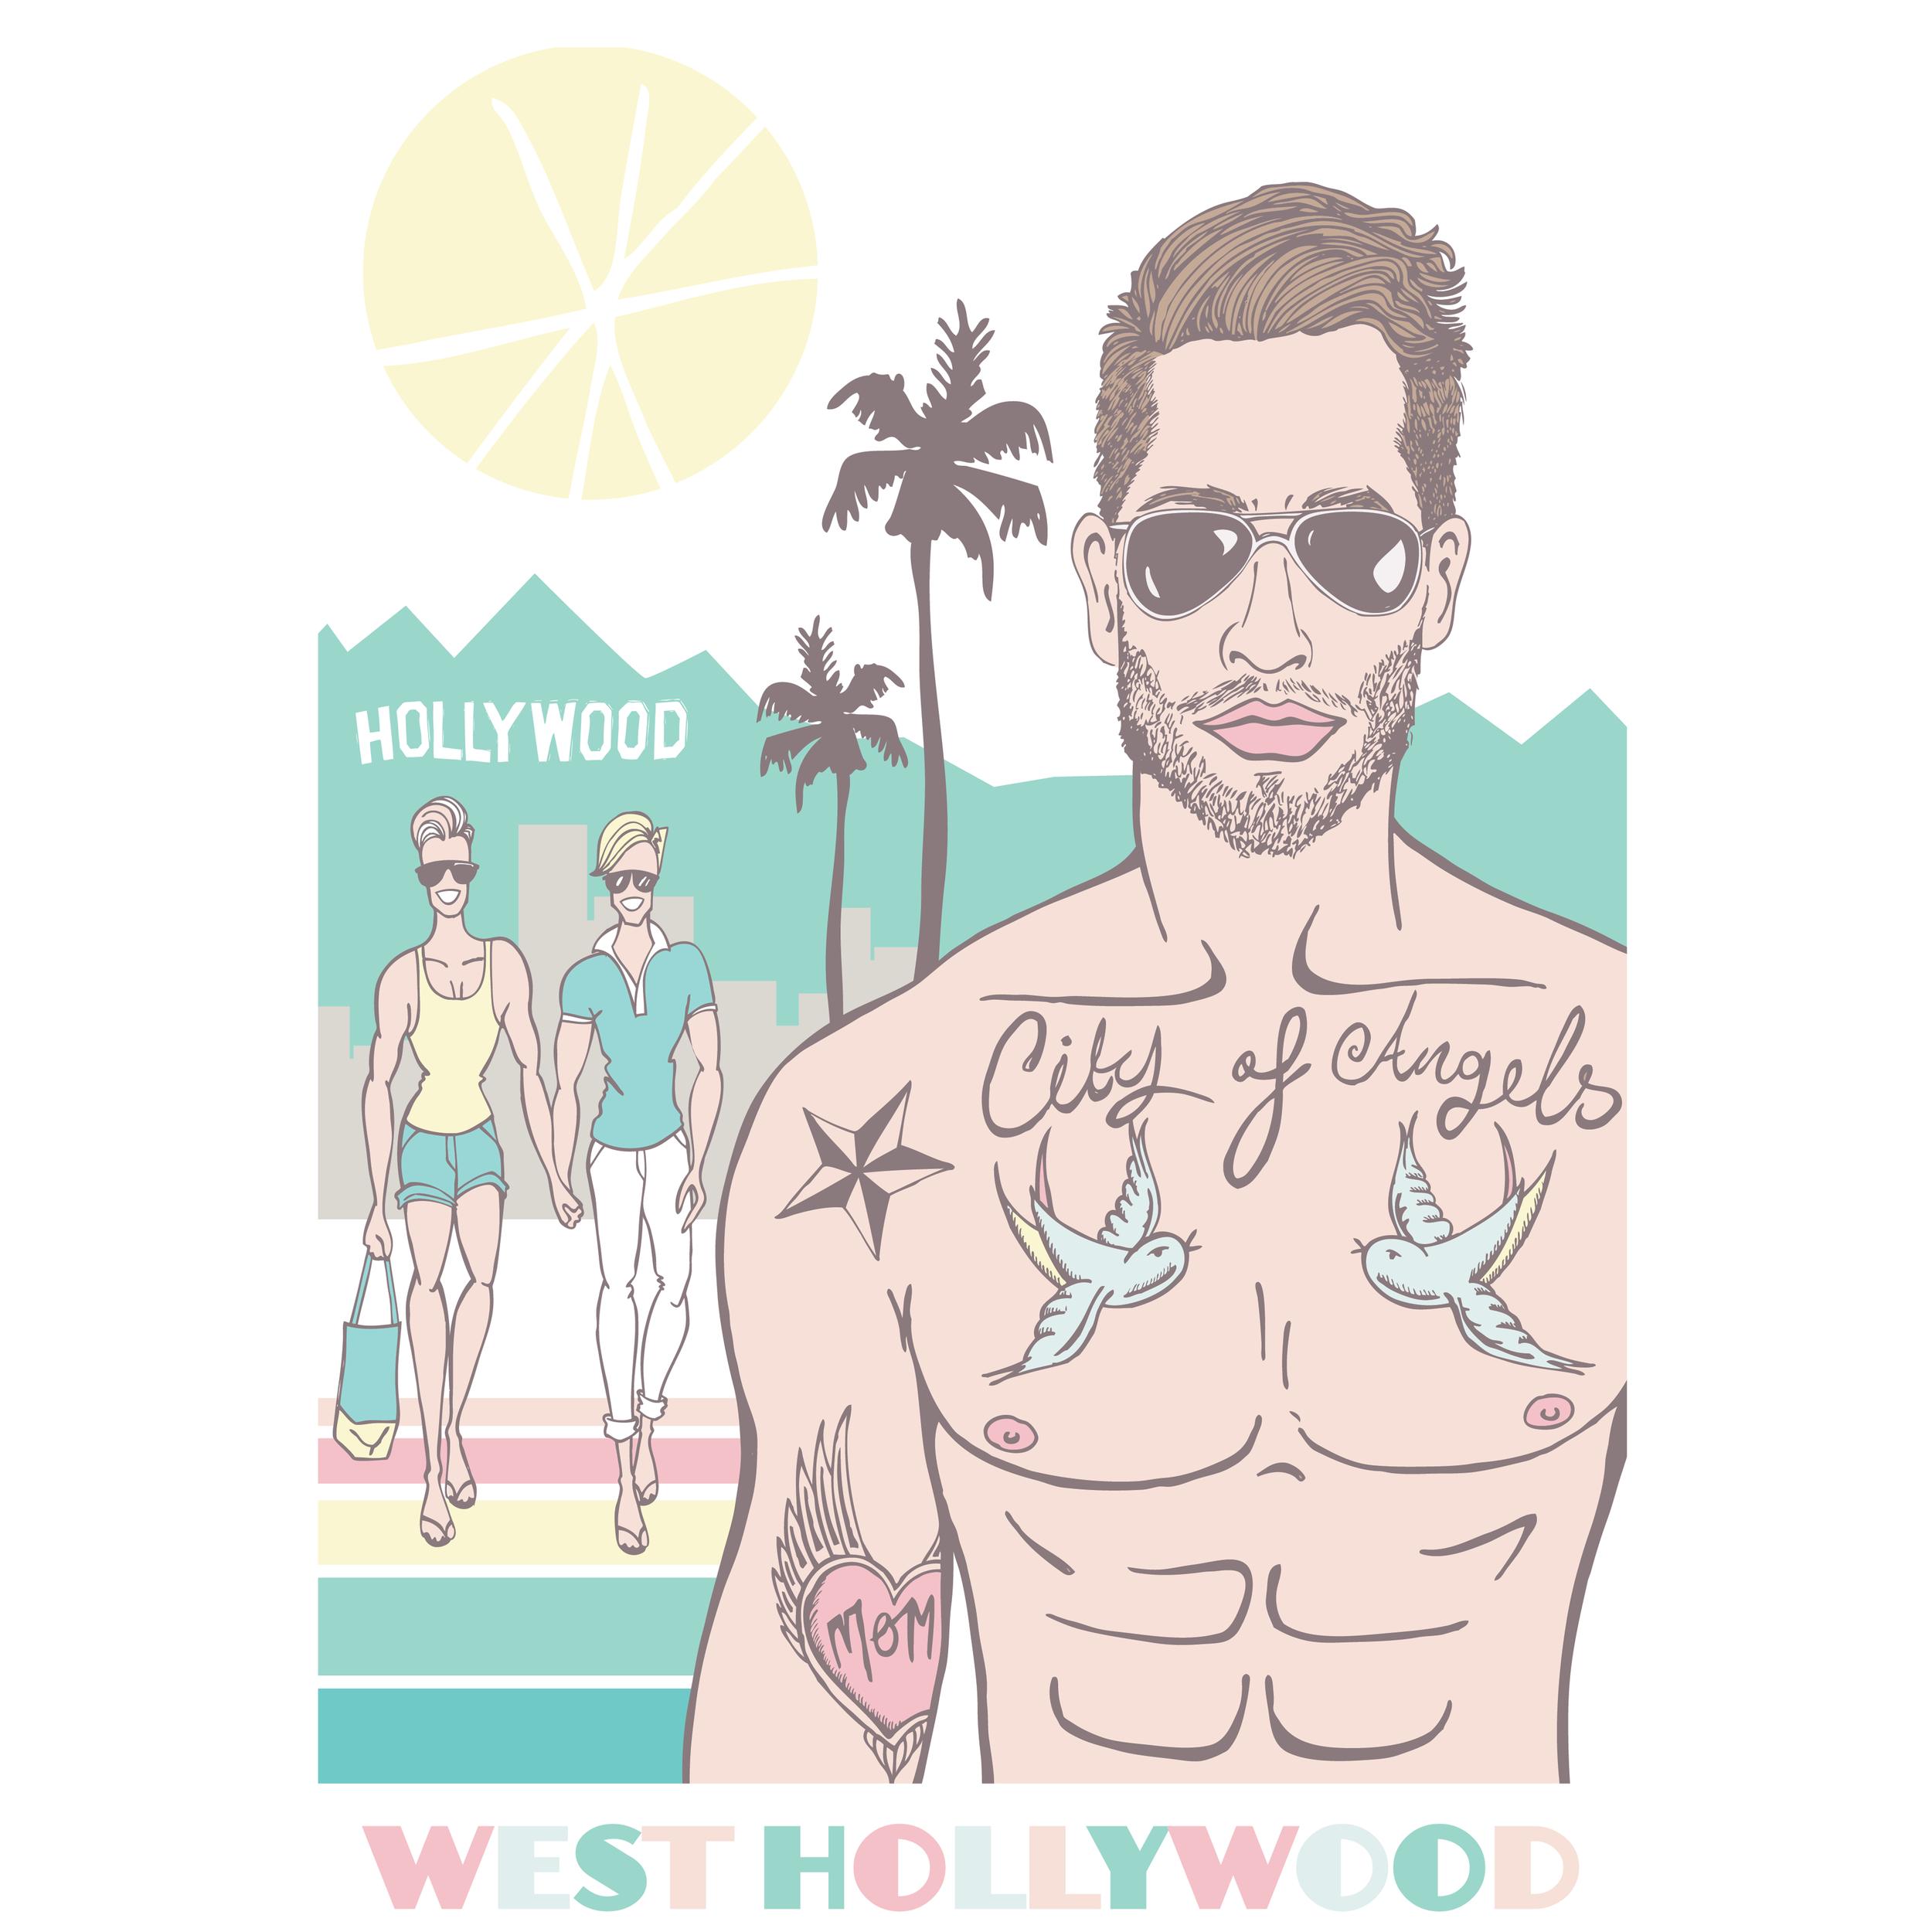 west hollywood website.png